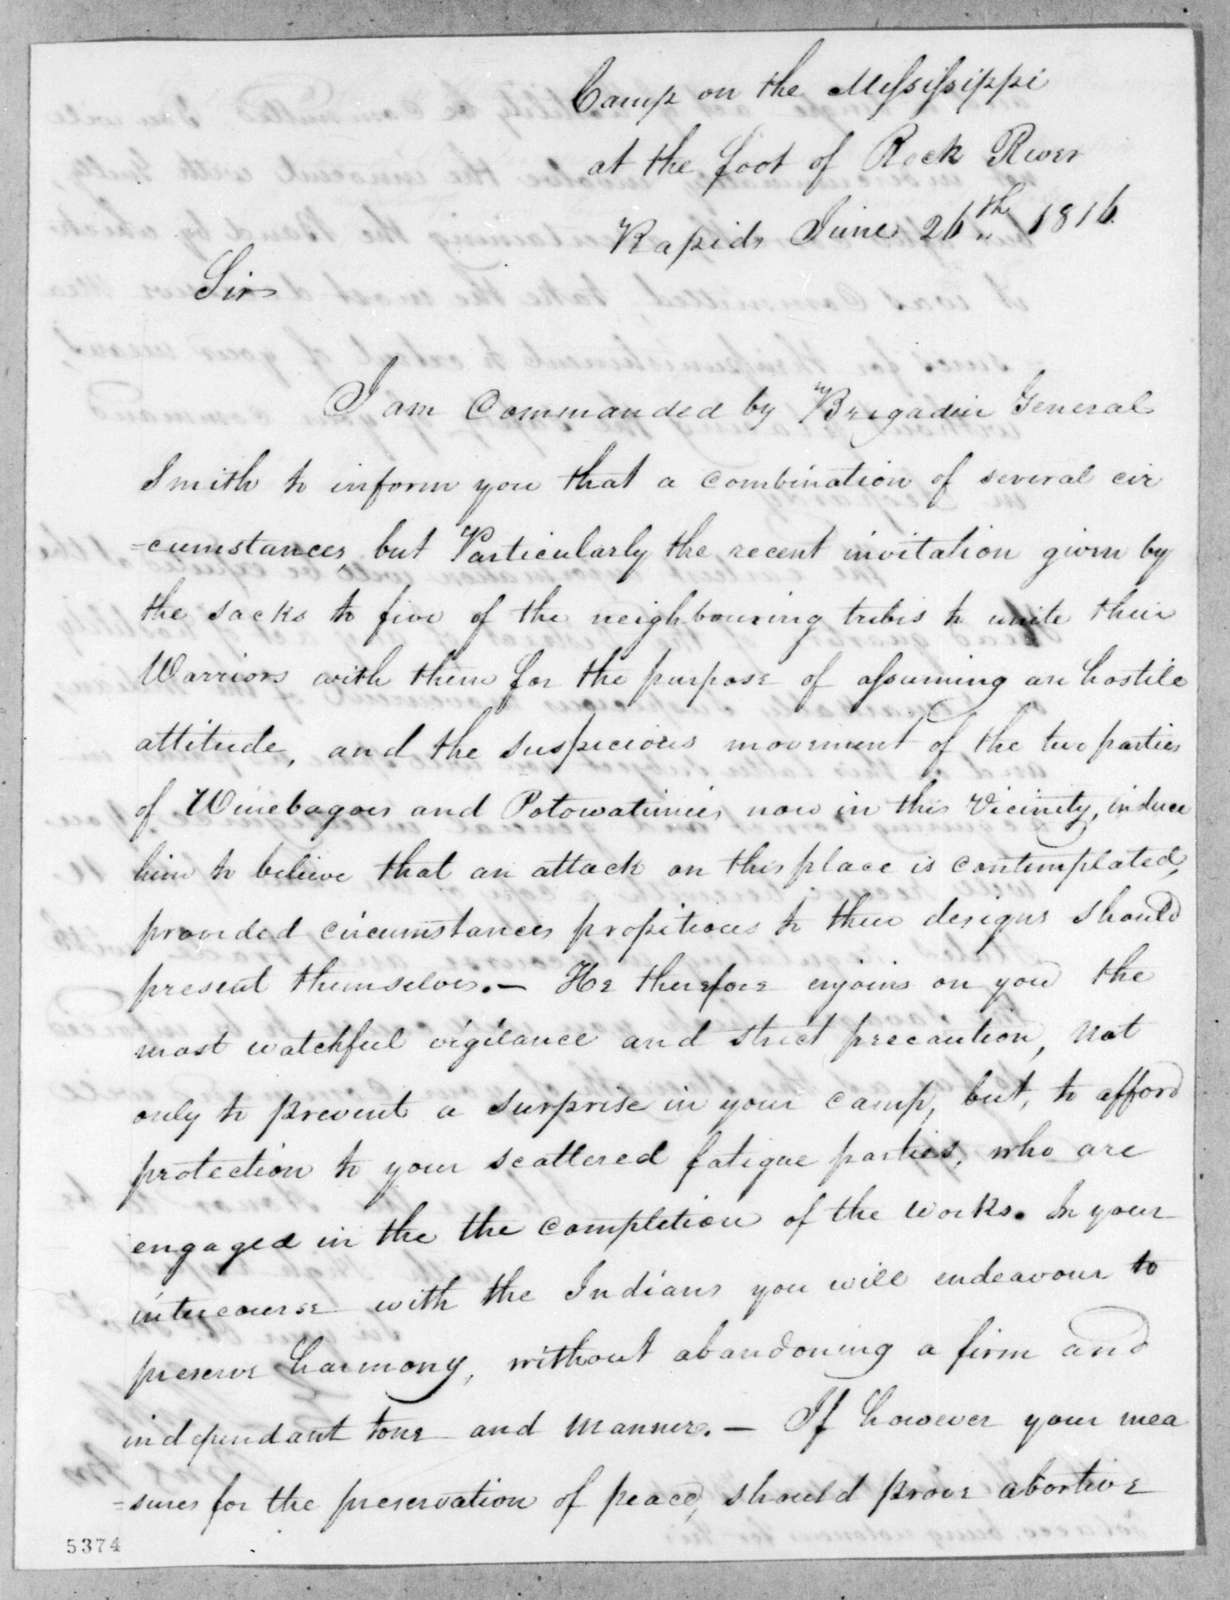 Edmund Shipp to William Lawrence, June 26, 1816